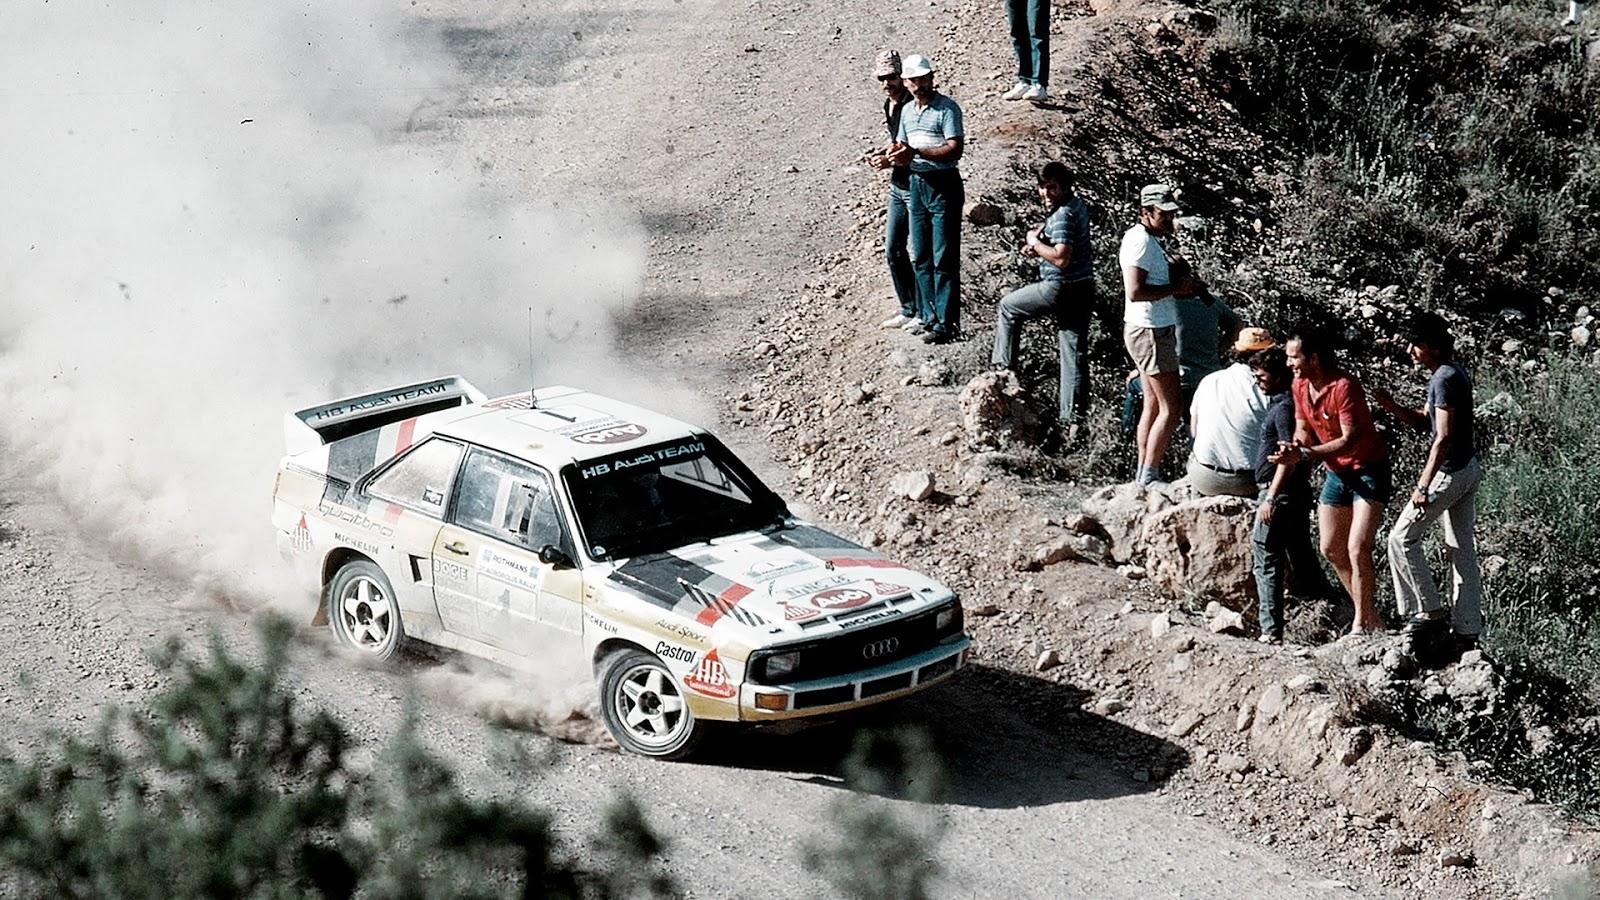 AUDI2BQUATTRO2BACROPOLIS2BRALLY2B1983 Χάνου Μίκολα, πρωταγωνιστής της αγωνιστικής ιστορίας της Audi Audi, Audi Quattro, αγωνες, ειδήσεις